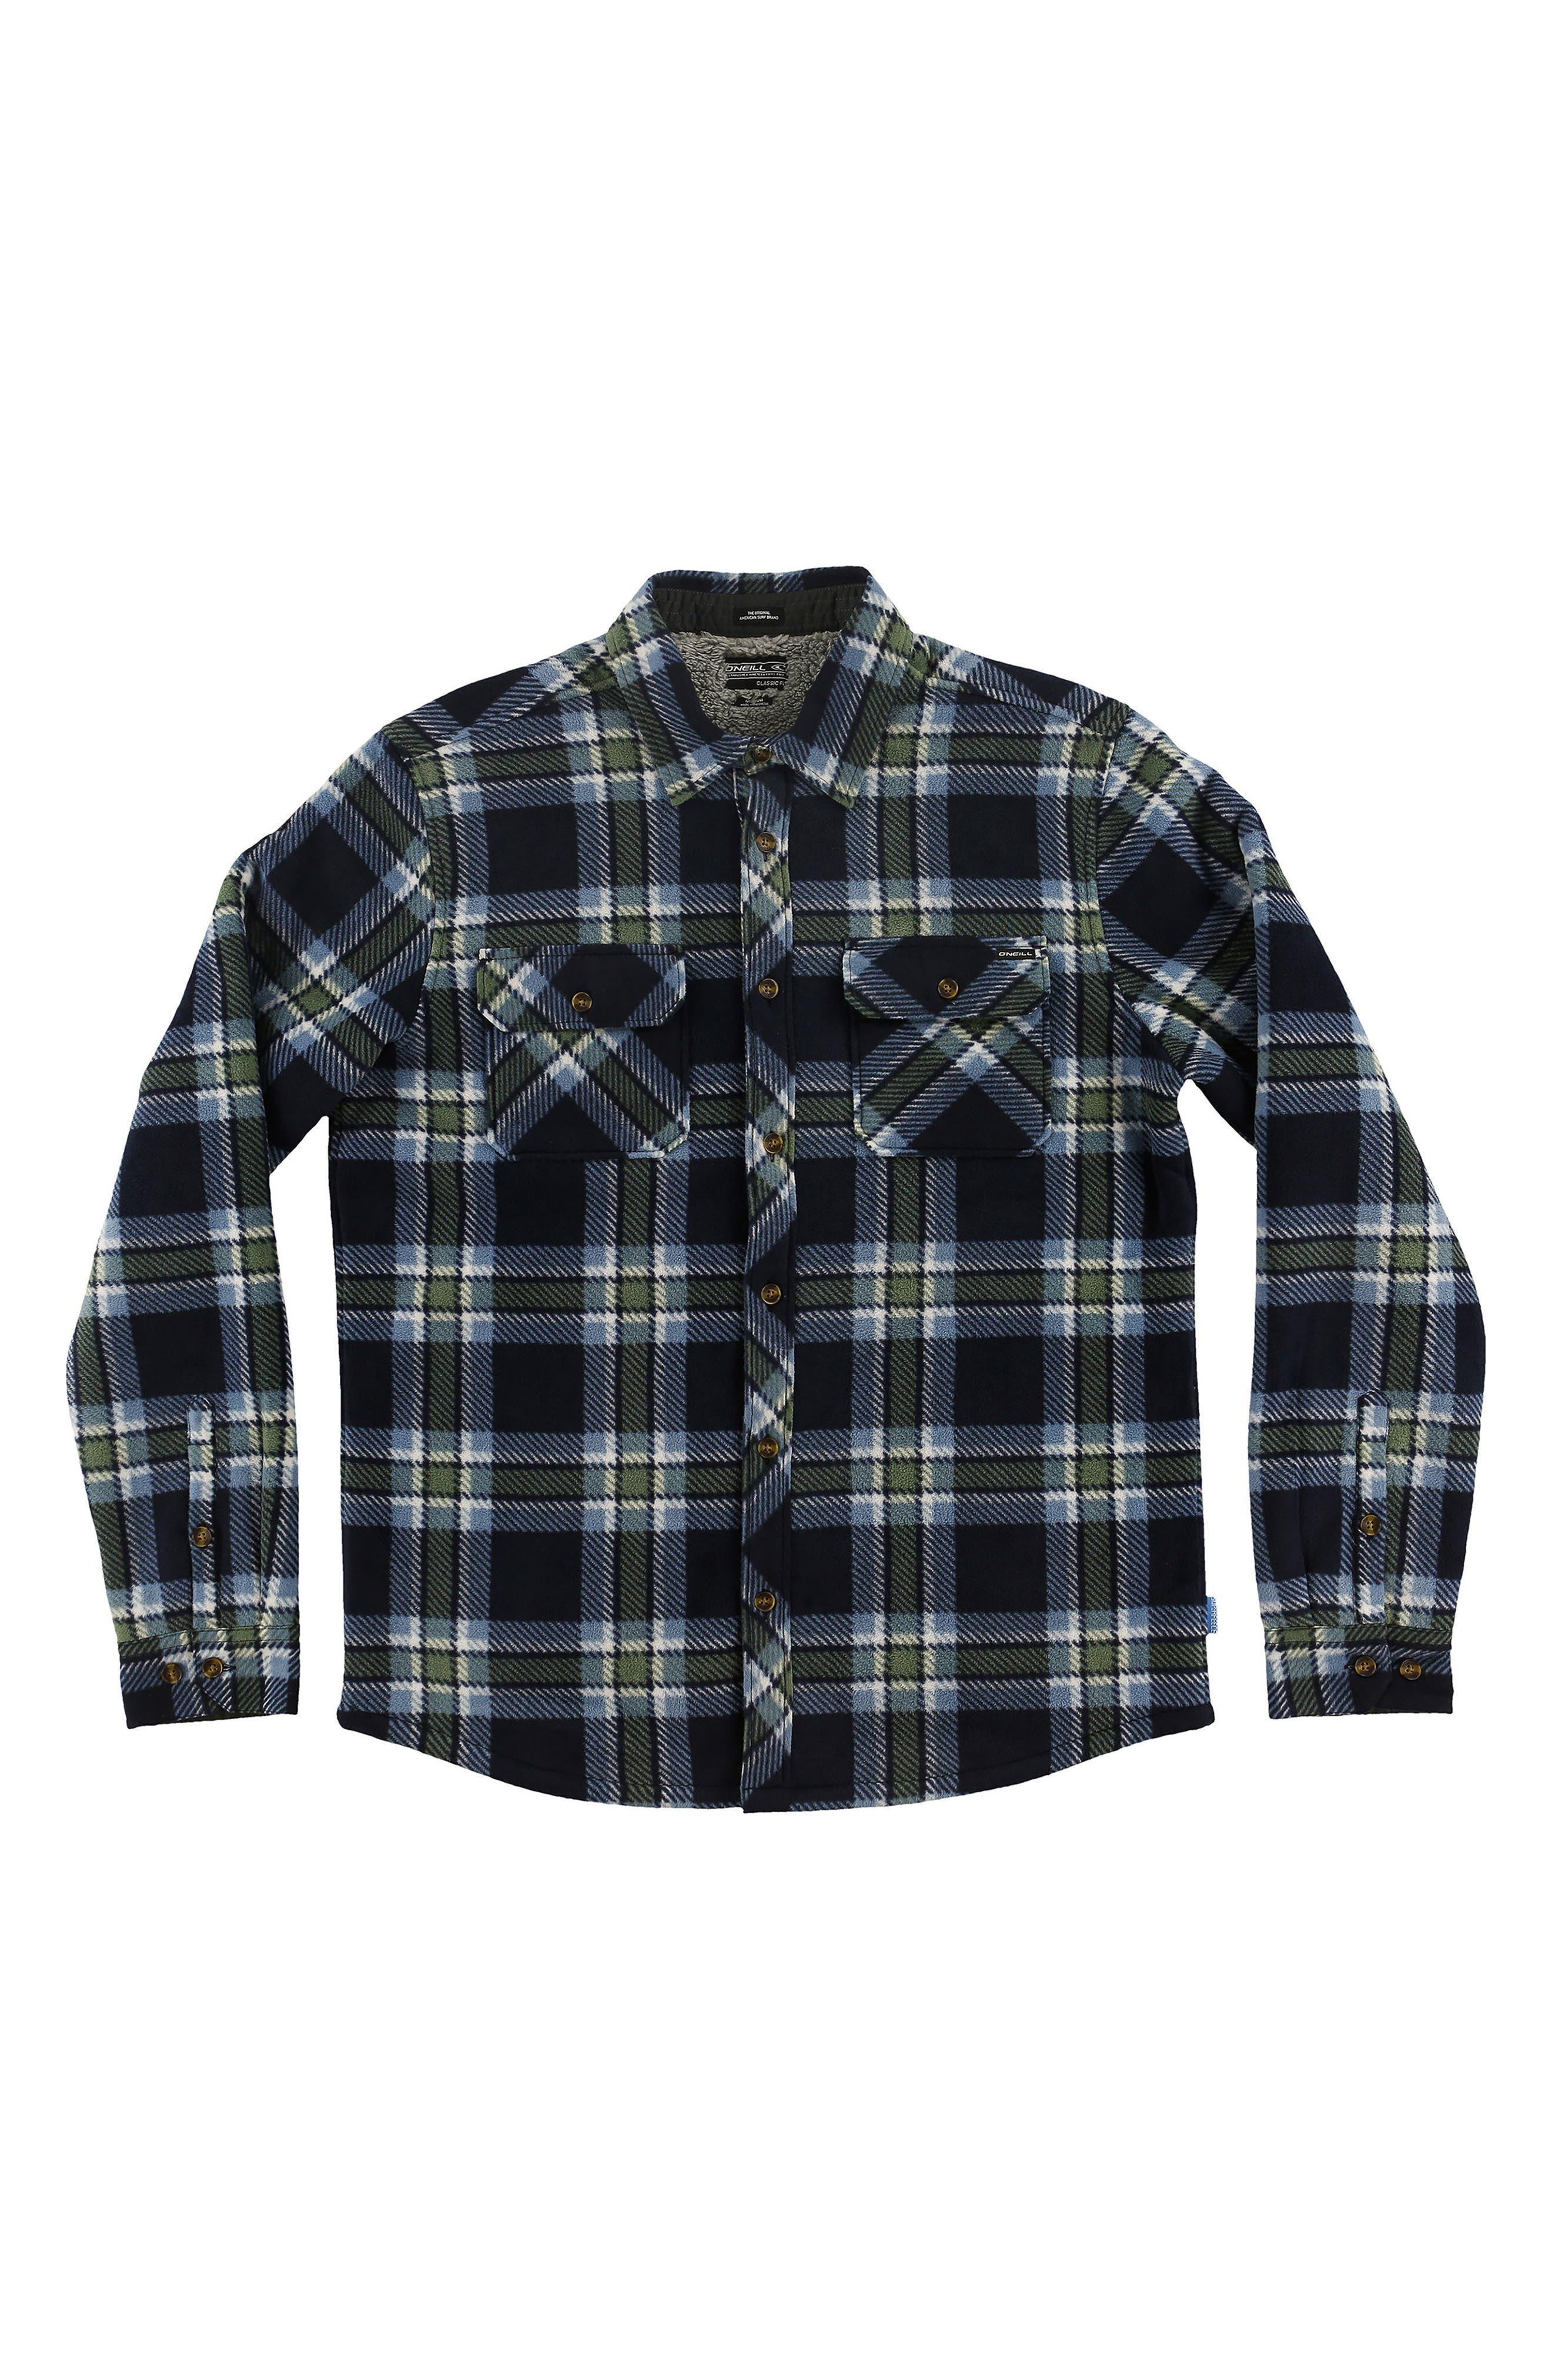 O'NEILL,                             Glacier Heat Dome Terry Plaid Shirt,                             Main thumbnail 1, color,                             410